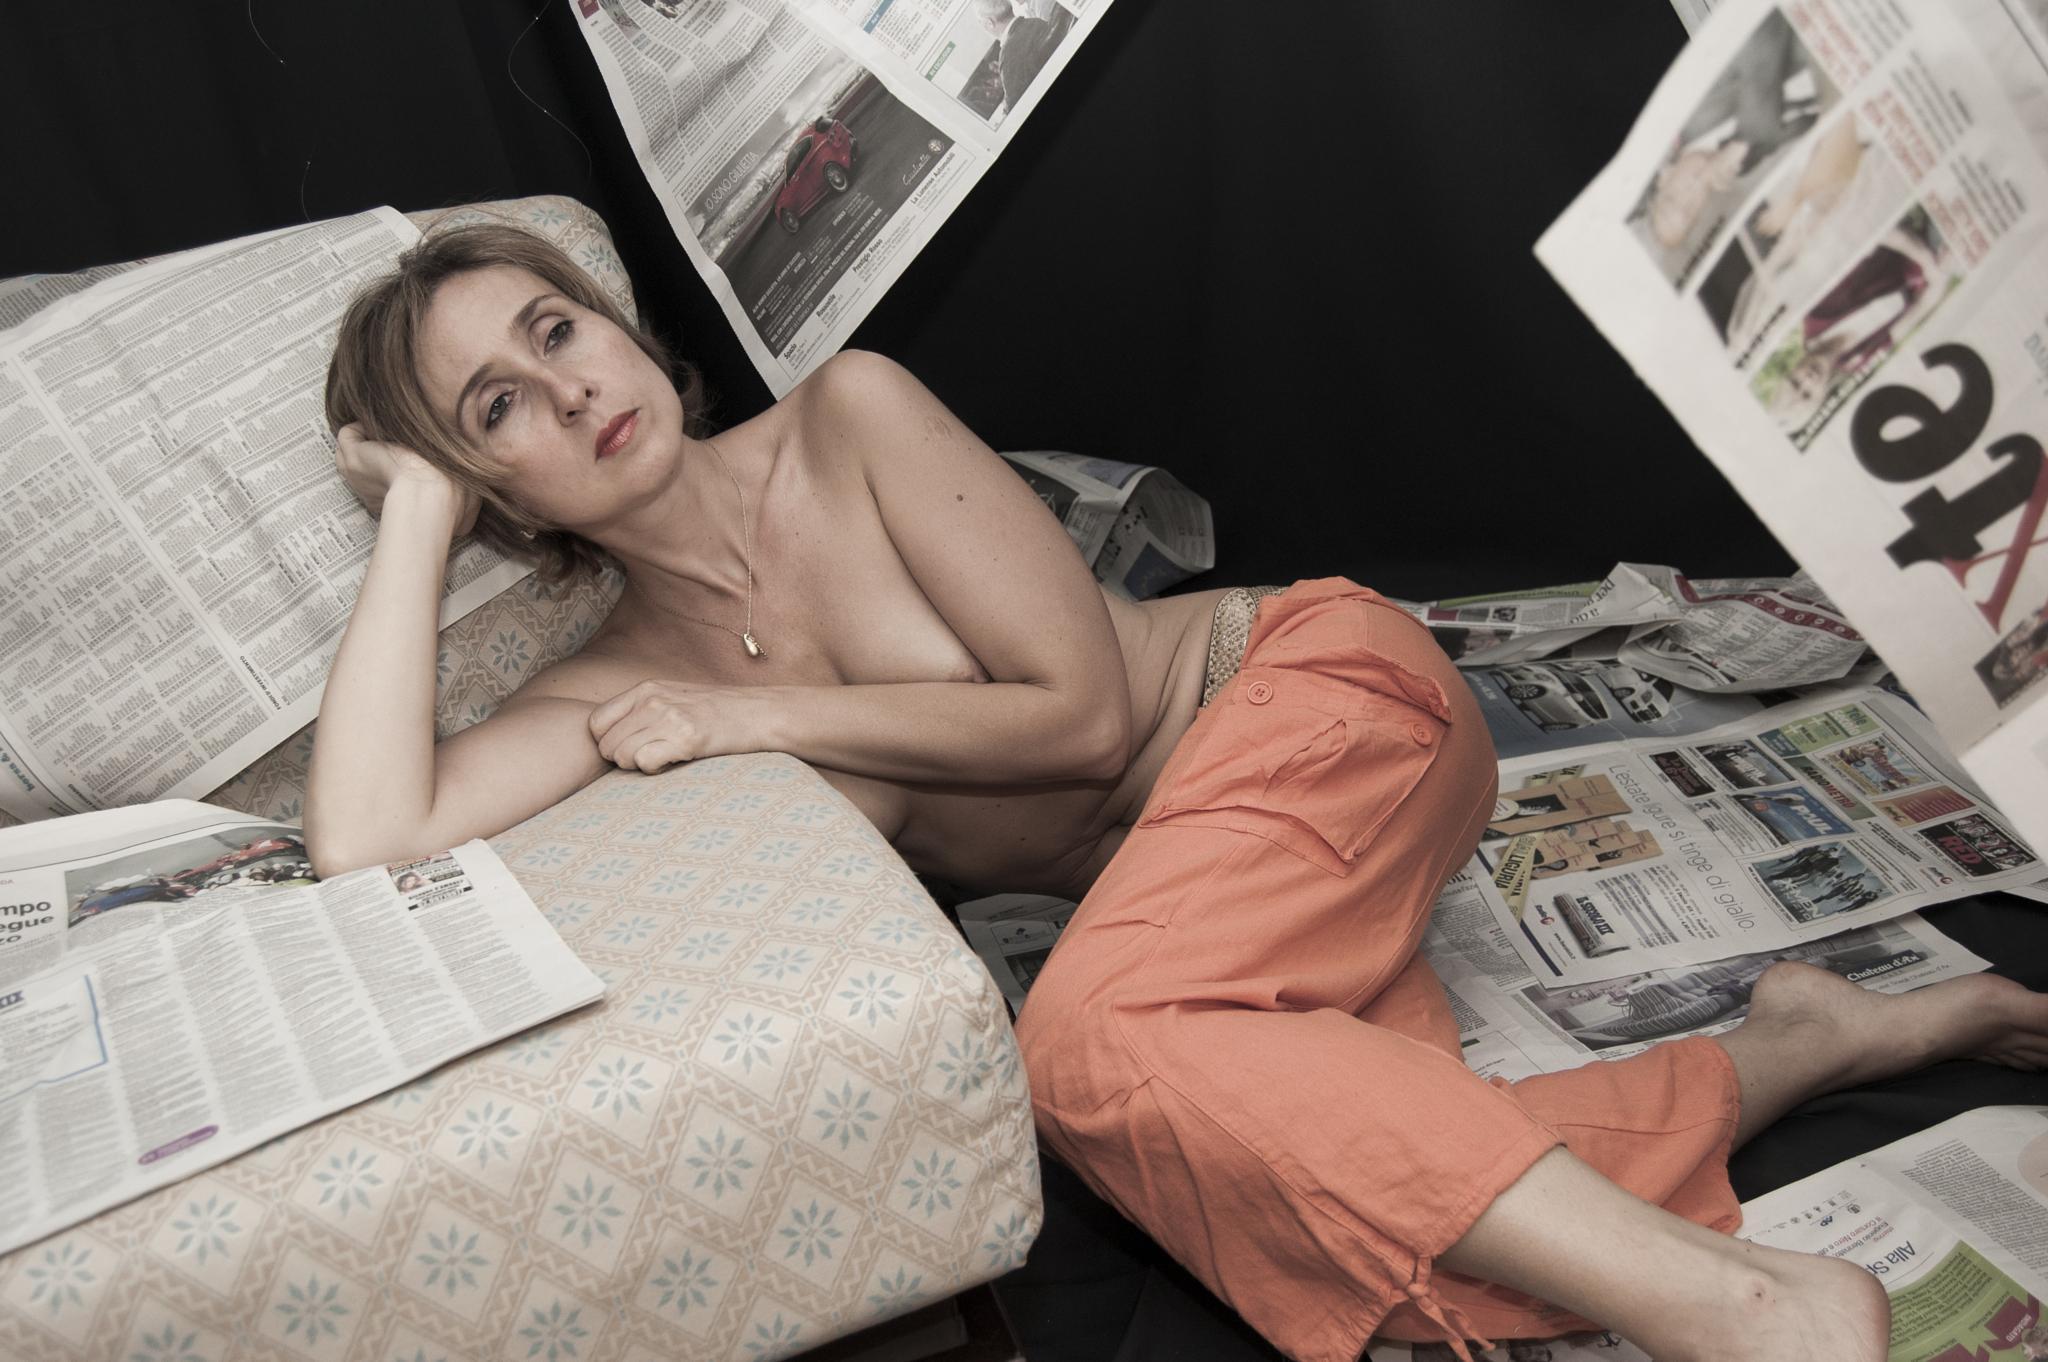 Newspapers by gabriele.zucchella